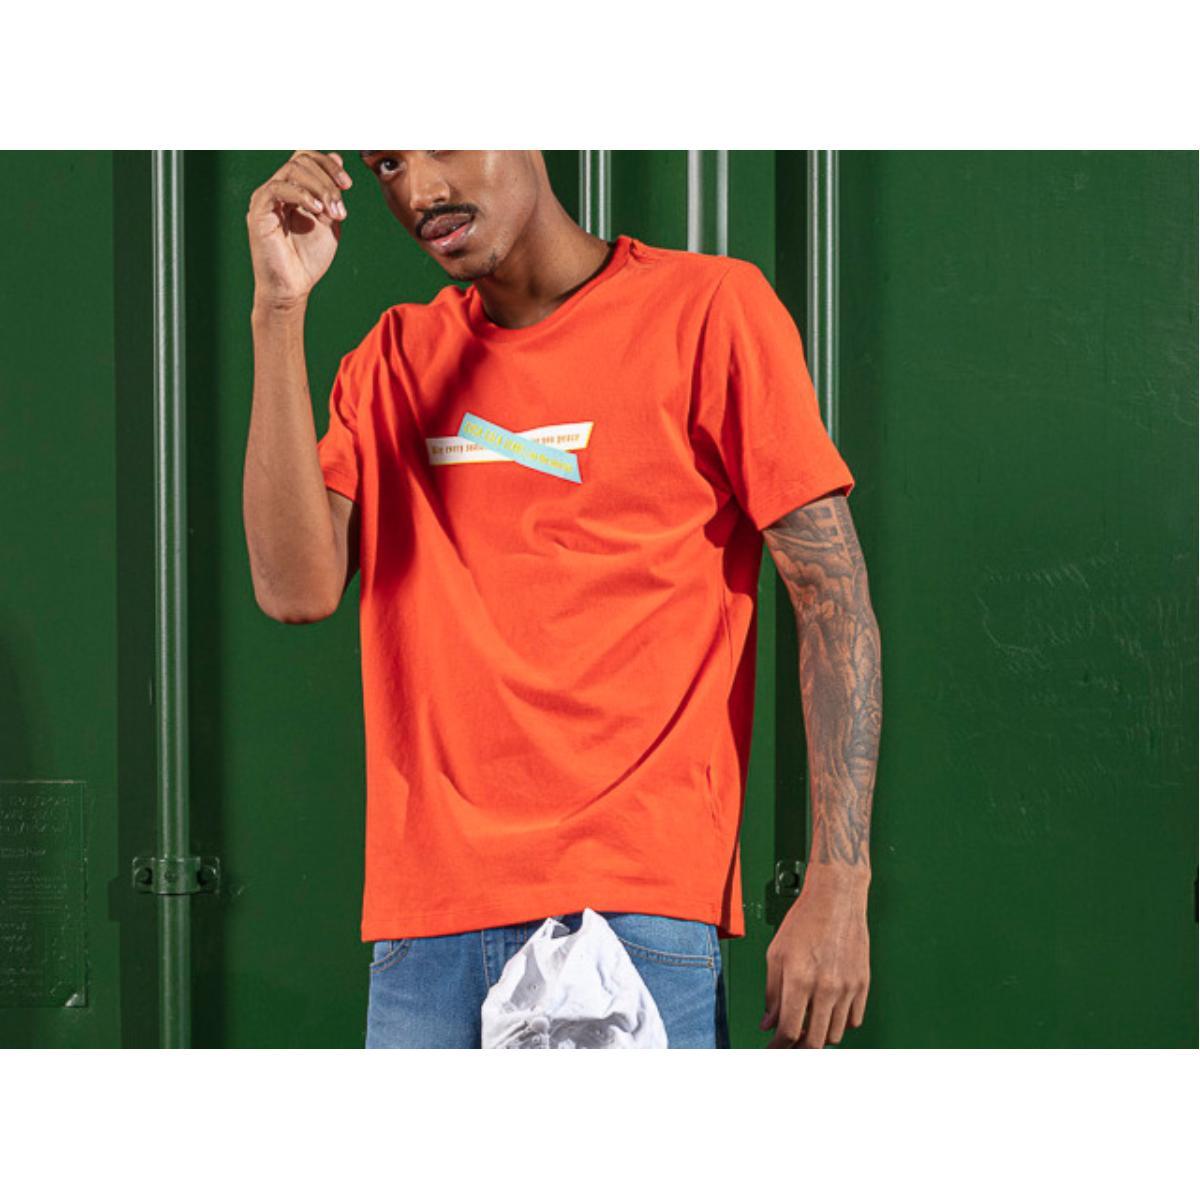 Camiseta Masculina Coca-cola Clothing 353207597 53708 Laranja